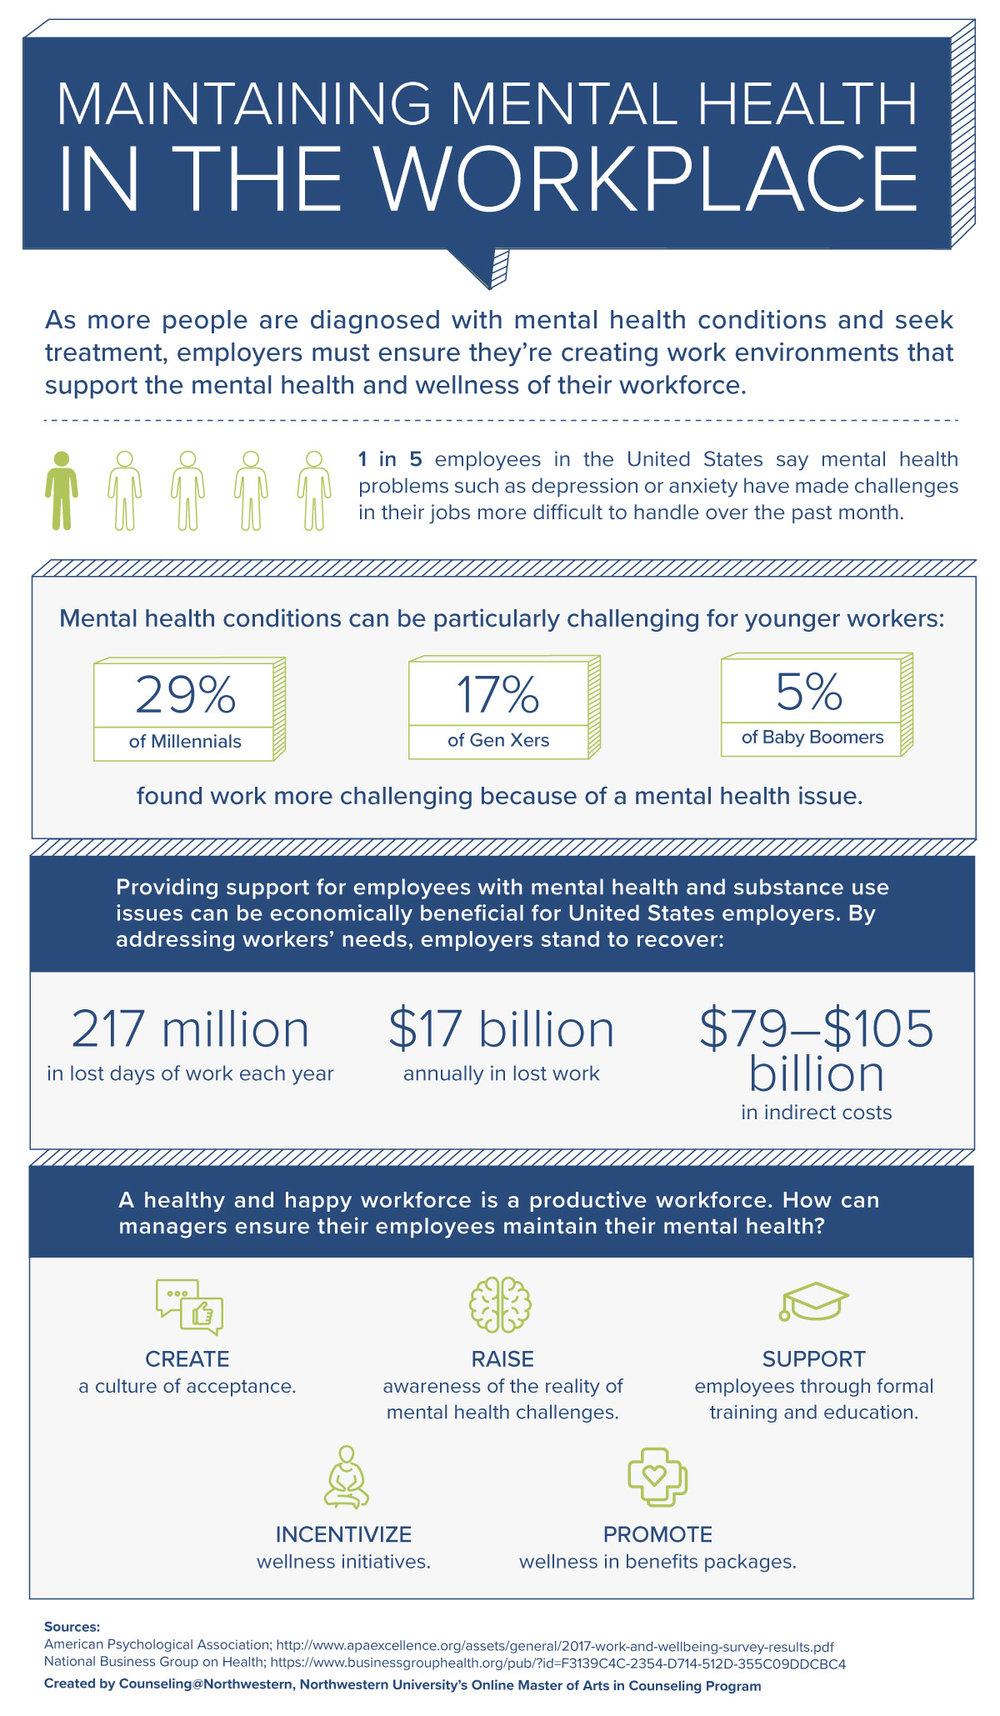 MentalHealthInWorkplace-Graphic.jpg